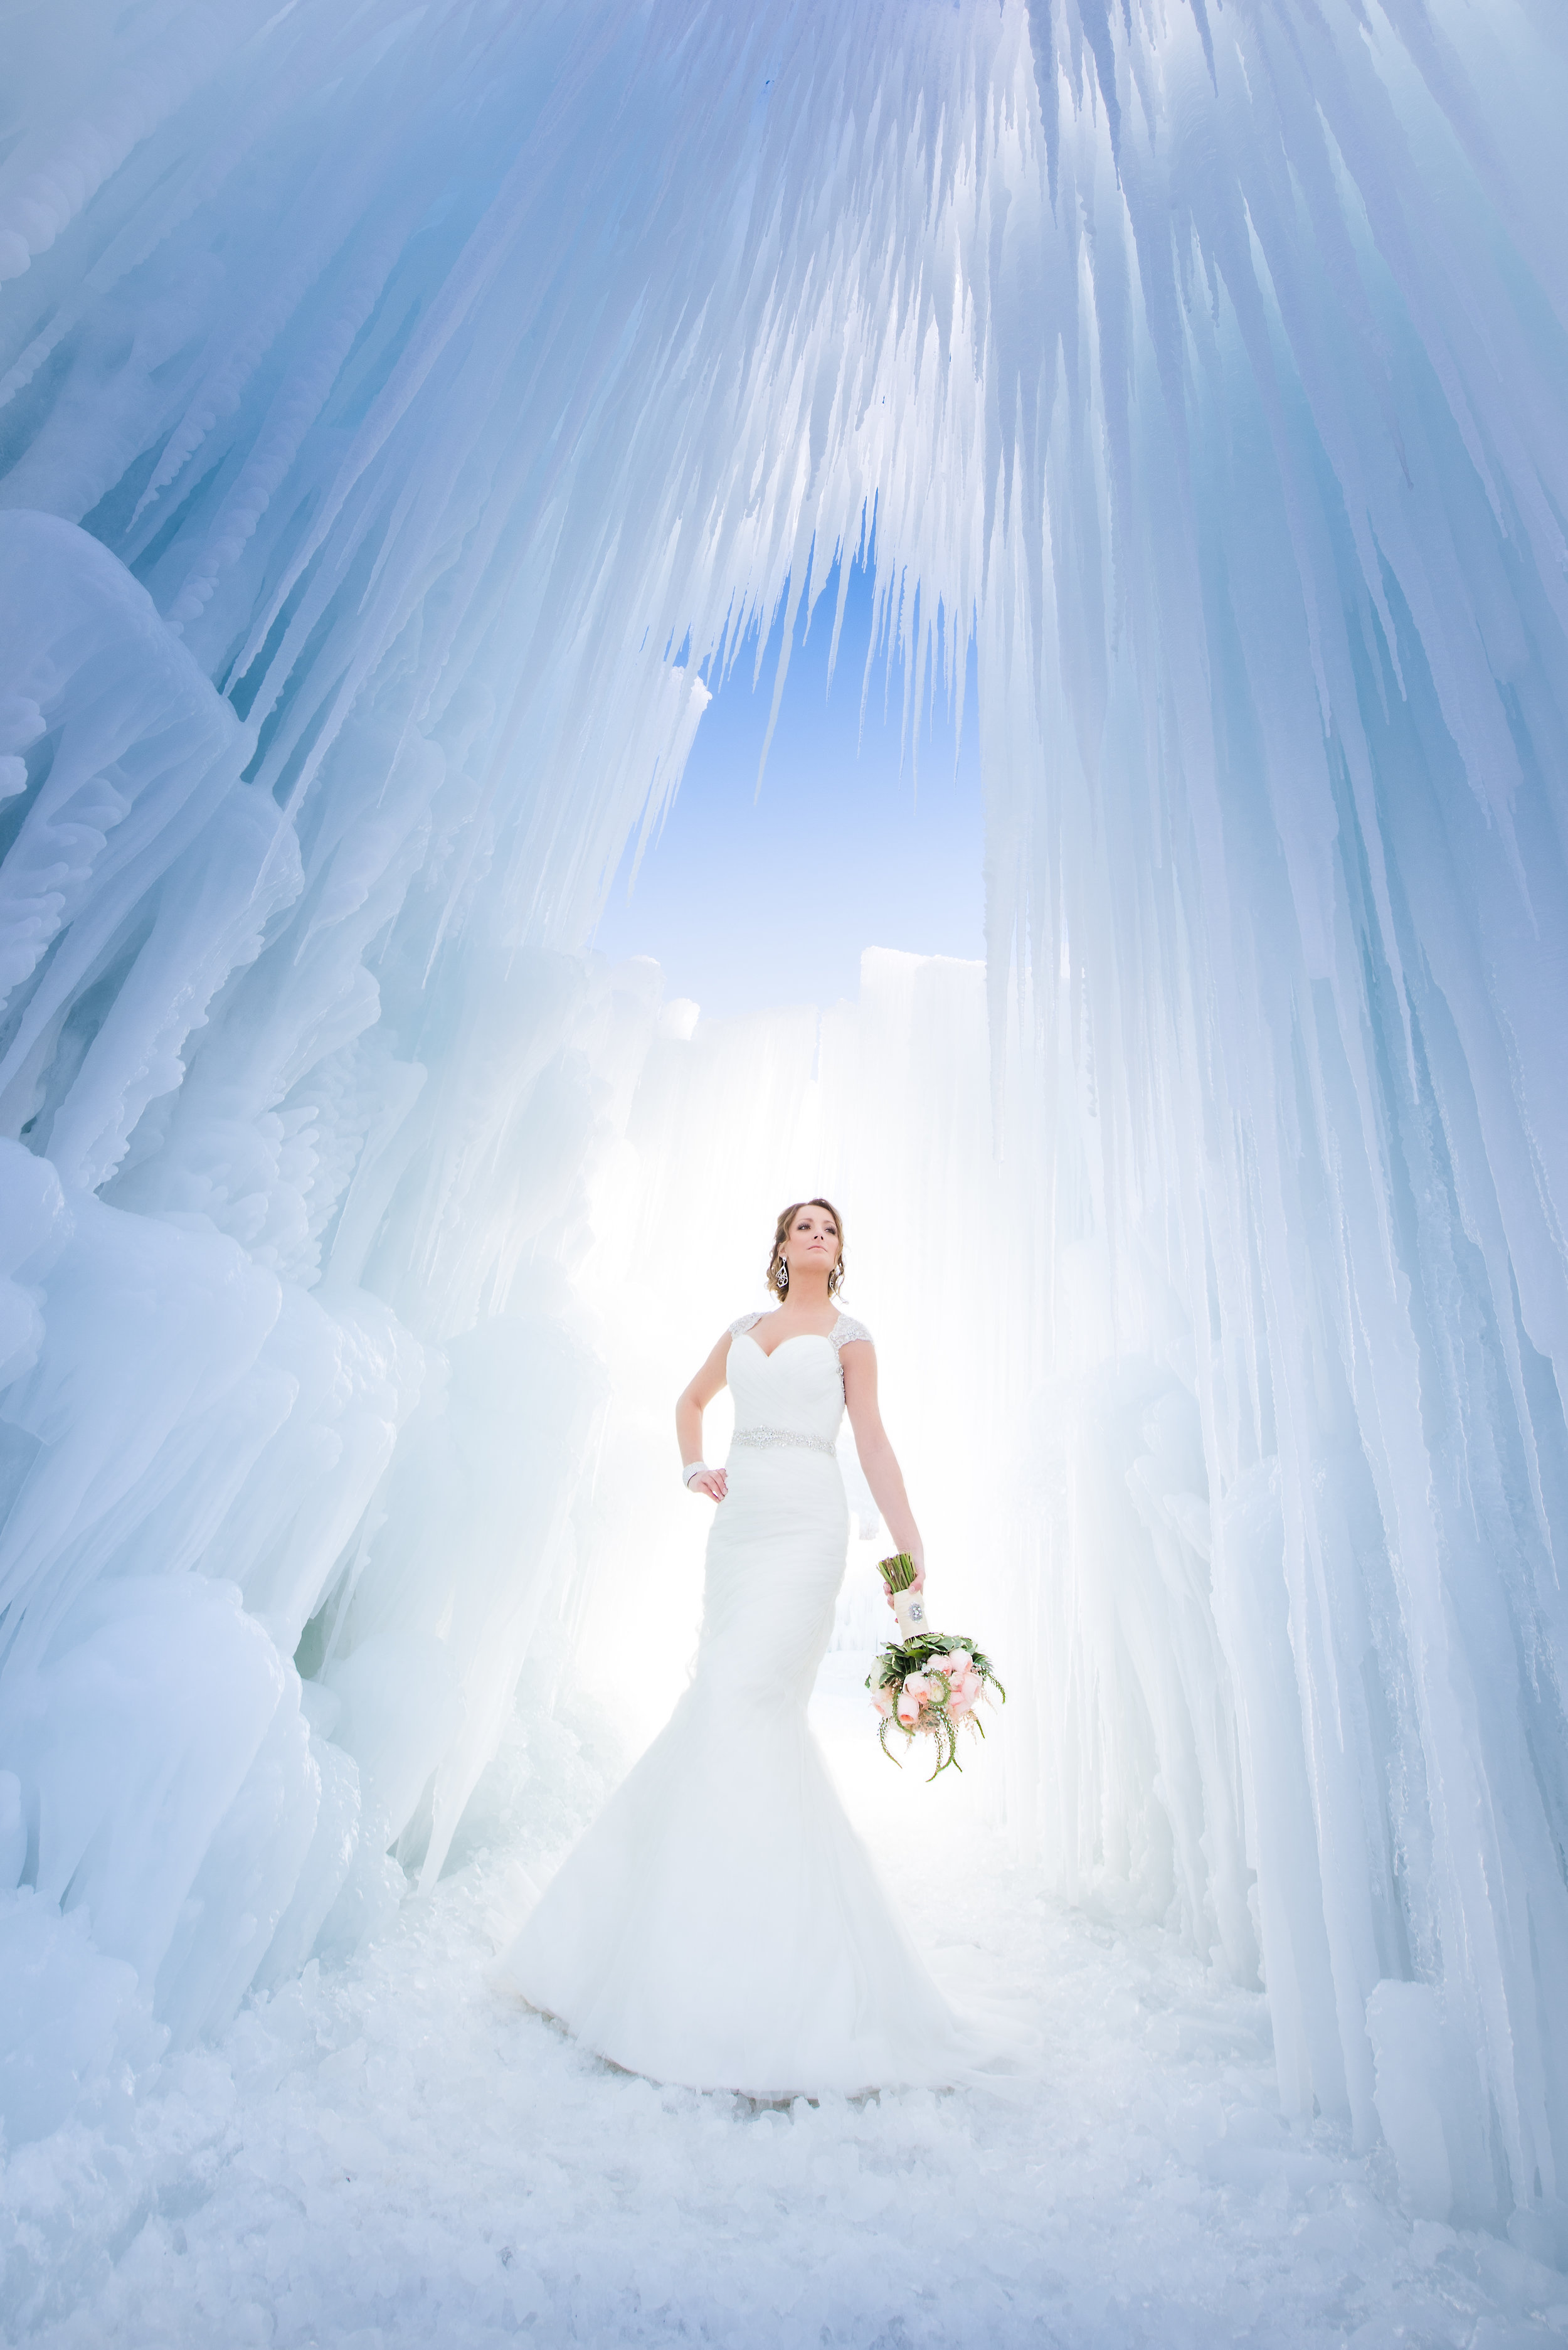 Midway bride